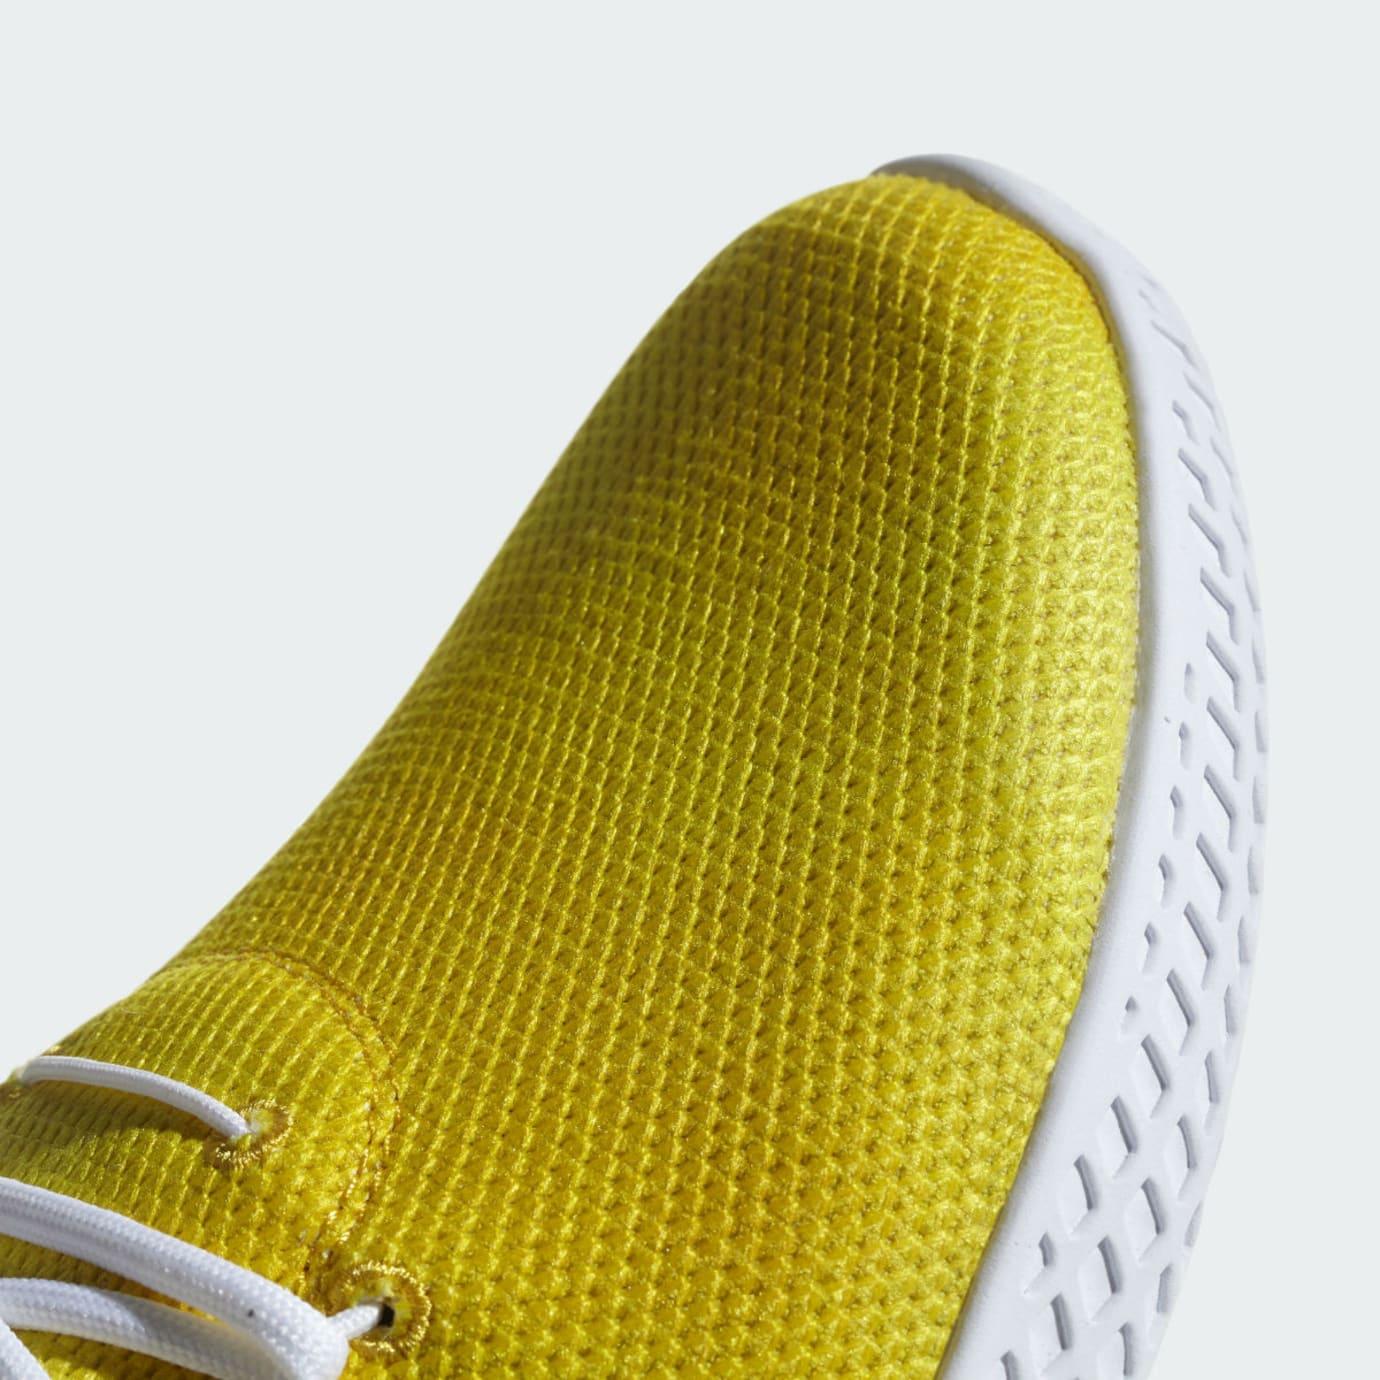 Pharrell x Adidas Tennis Hu Holi Bright Yellow Release Date DA9617 Toe